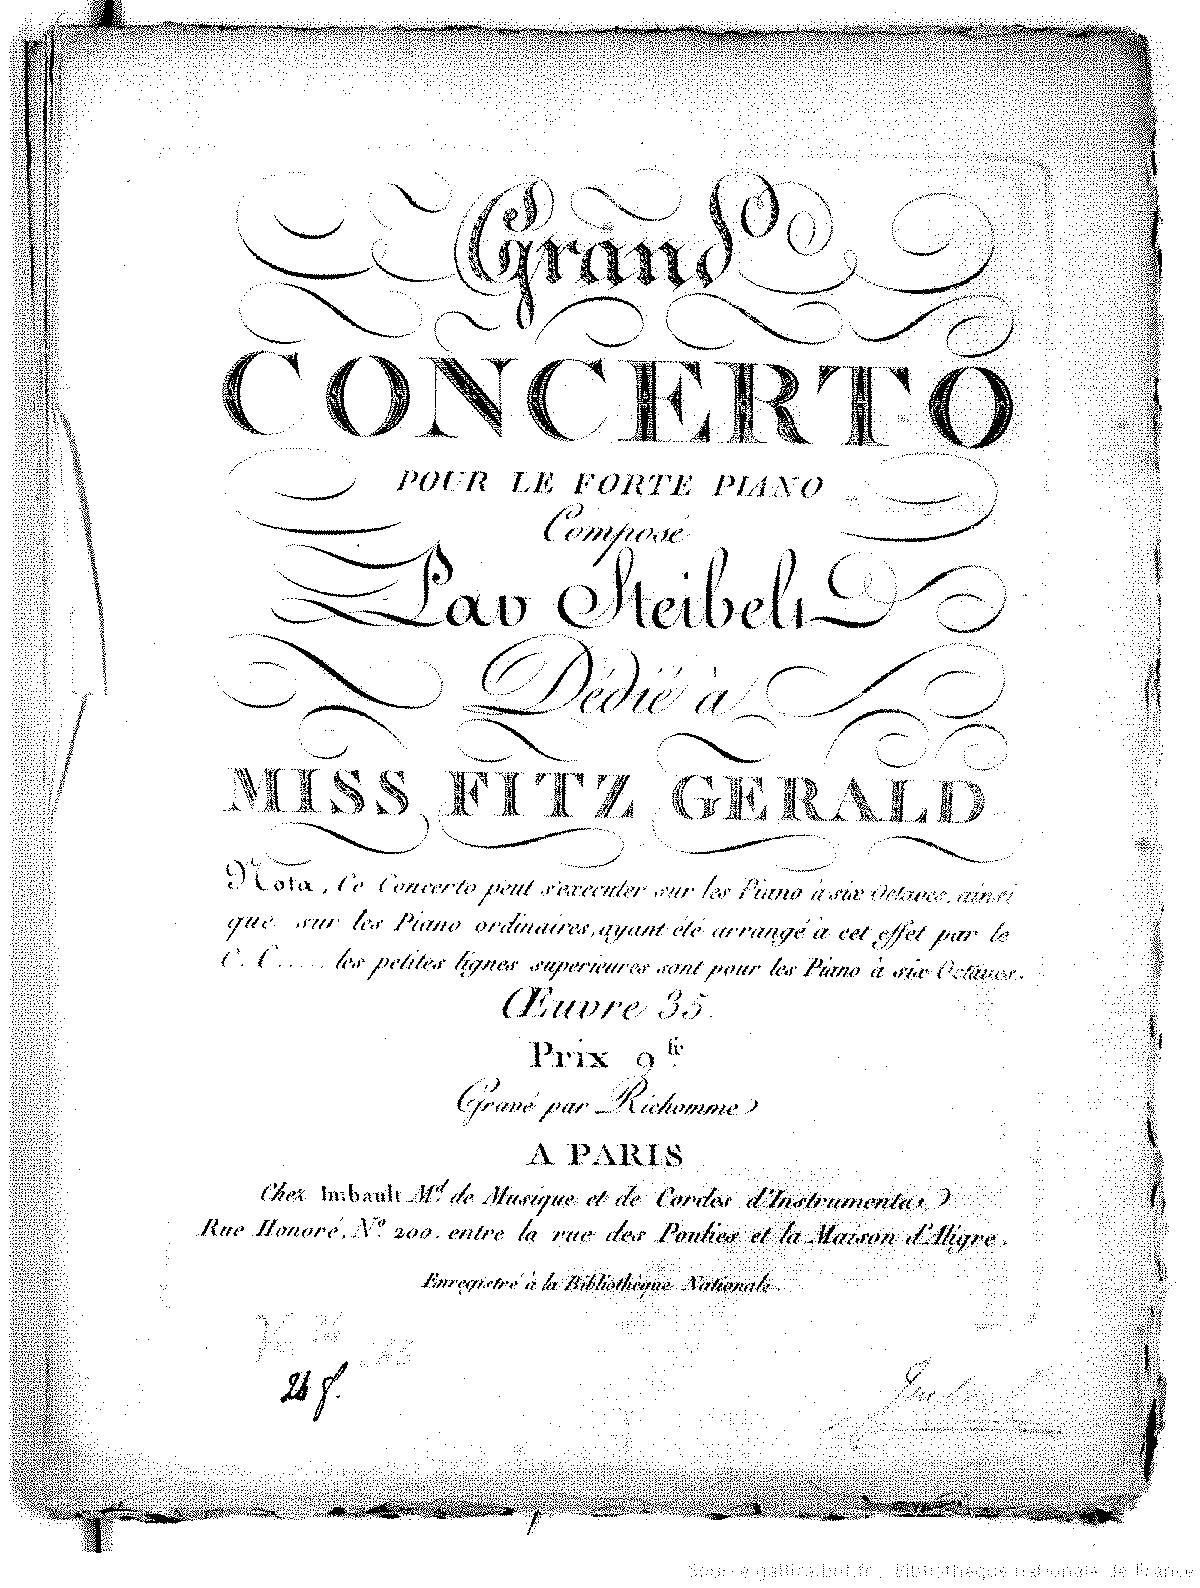 piano concerto no 3 in e major op 33 steibelt daniel imslp